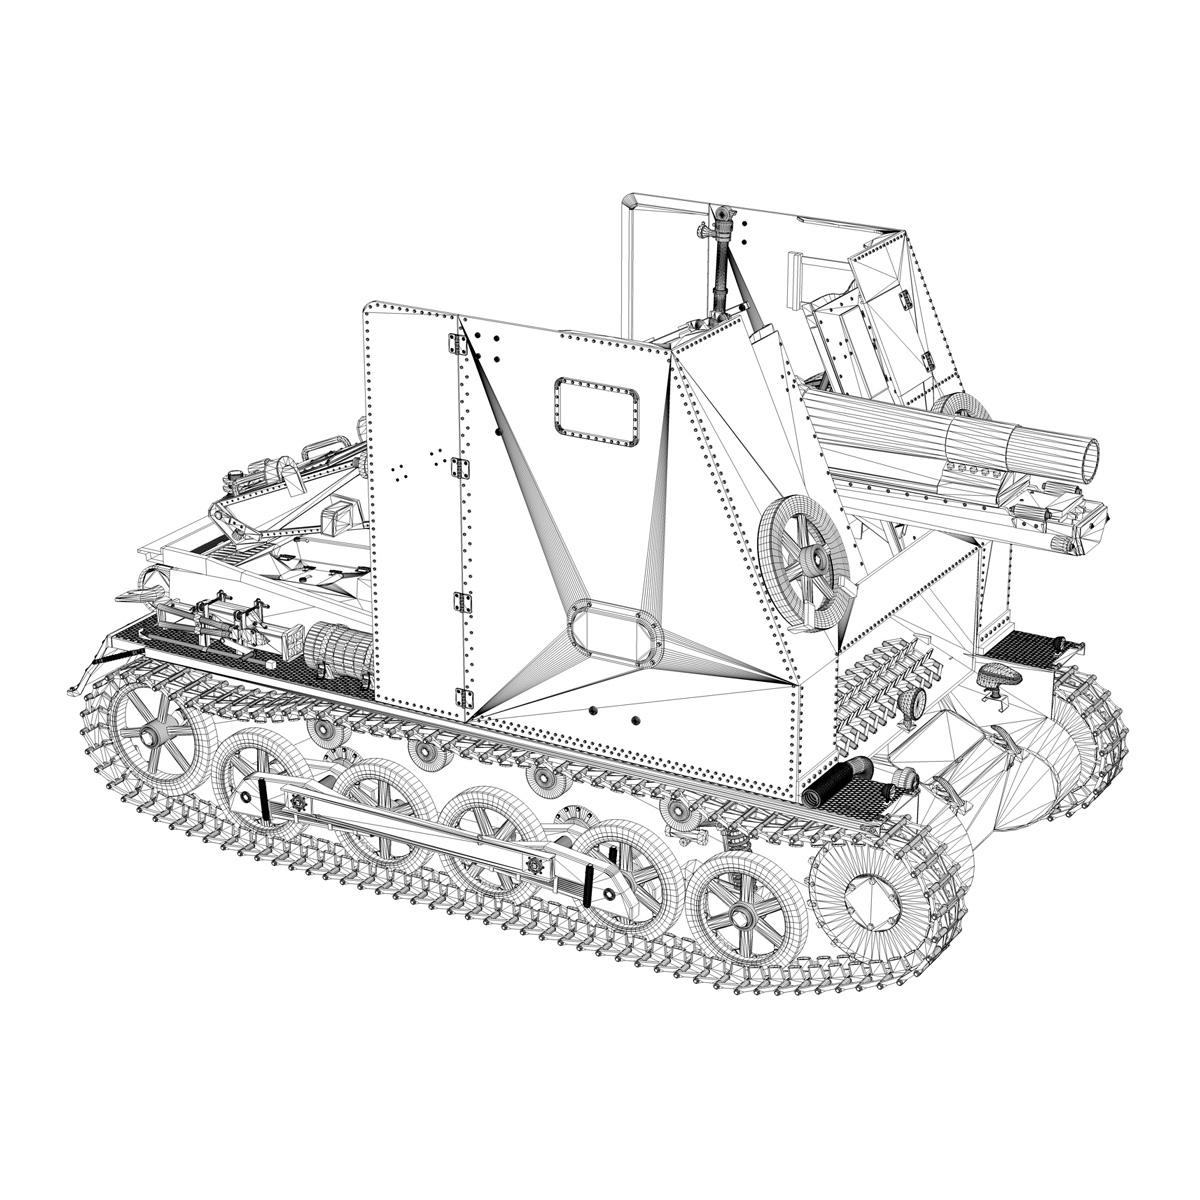 sd.kfz 101 – sturmpanzer 1 – bison 3d model 3ds fbx c4d lwo obj 189280